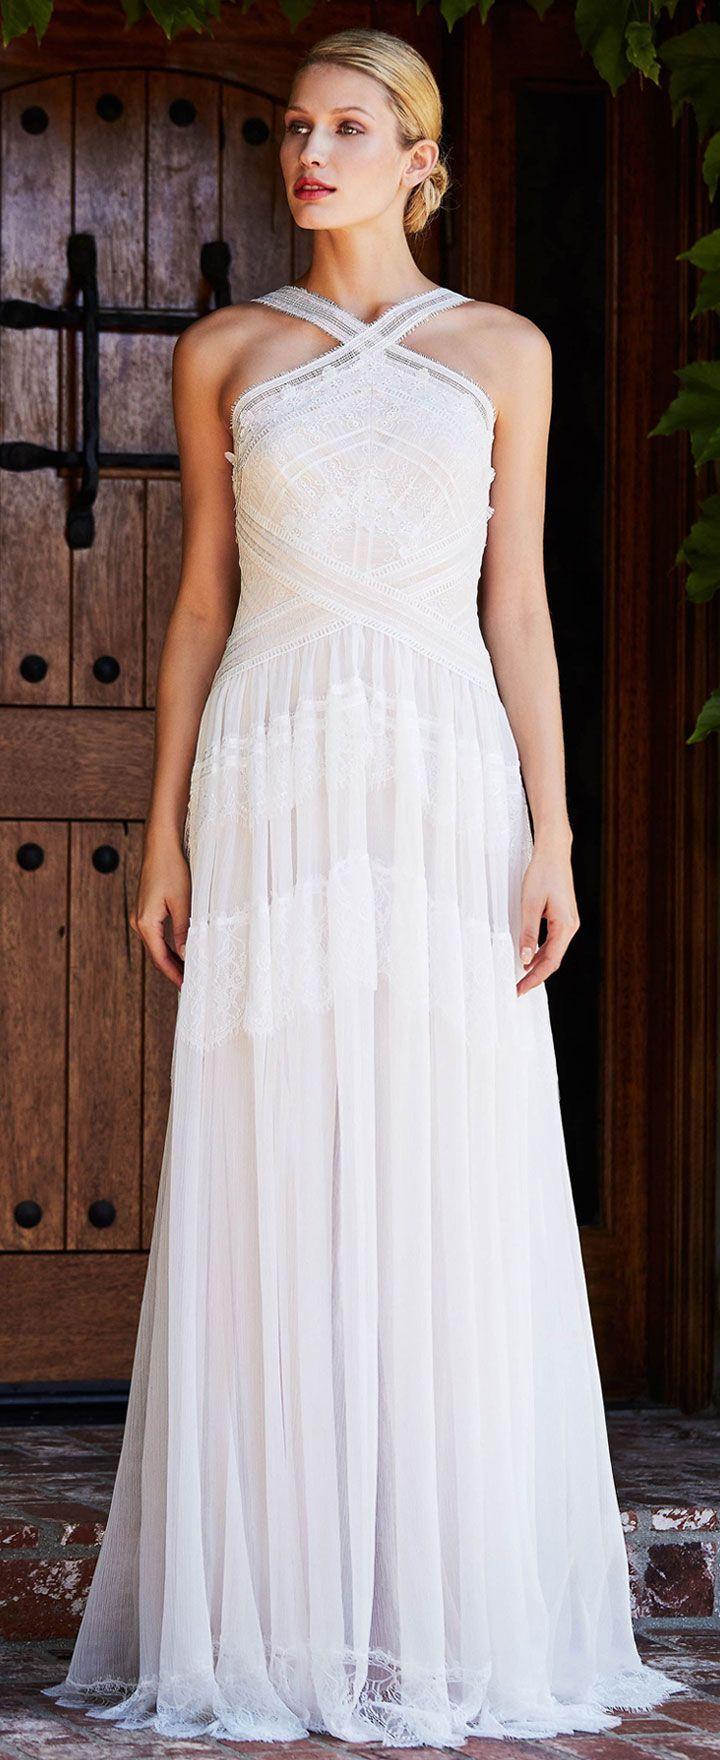 Tadashi Shoji Bridal Fall 2018 Wedding Dress Collection | Tadashi ...